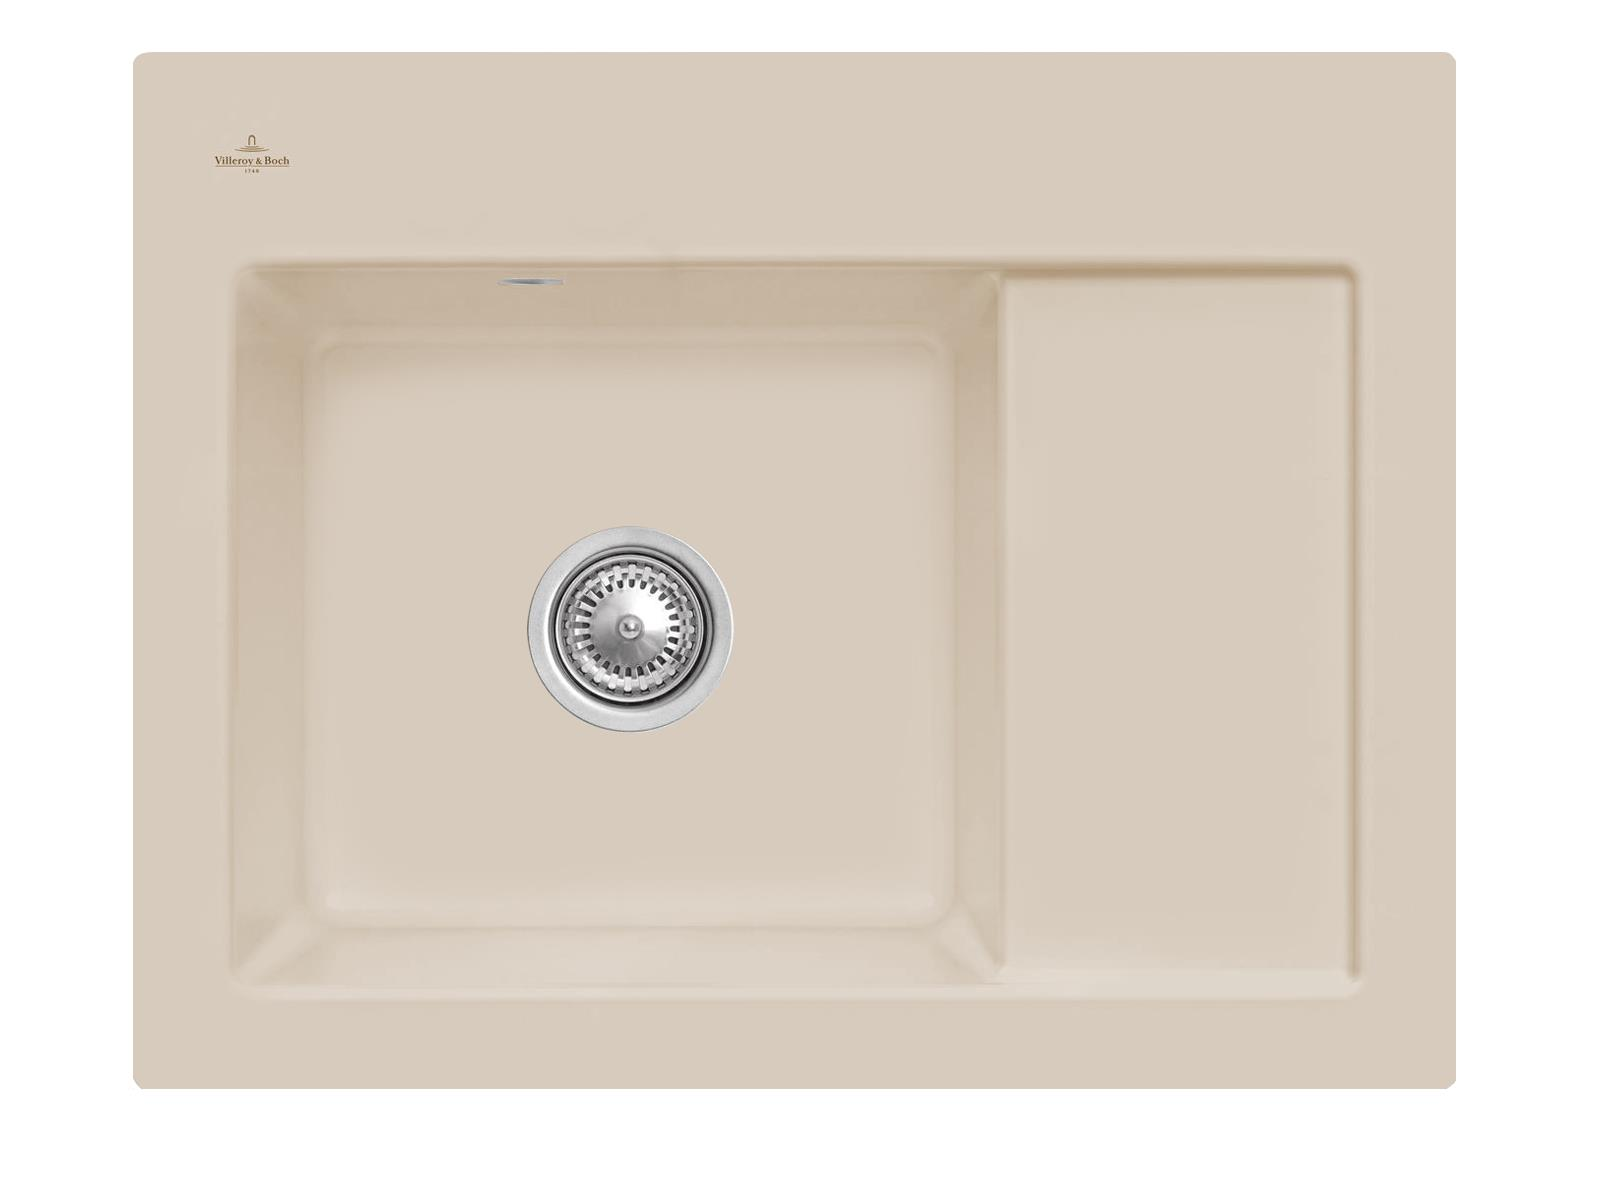 Villeroy & Boch Subway 45 Compact - 3312 01 AM Almond Keramikspüle Handbetätigung